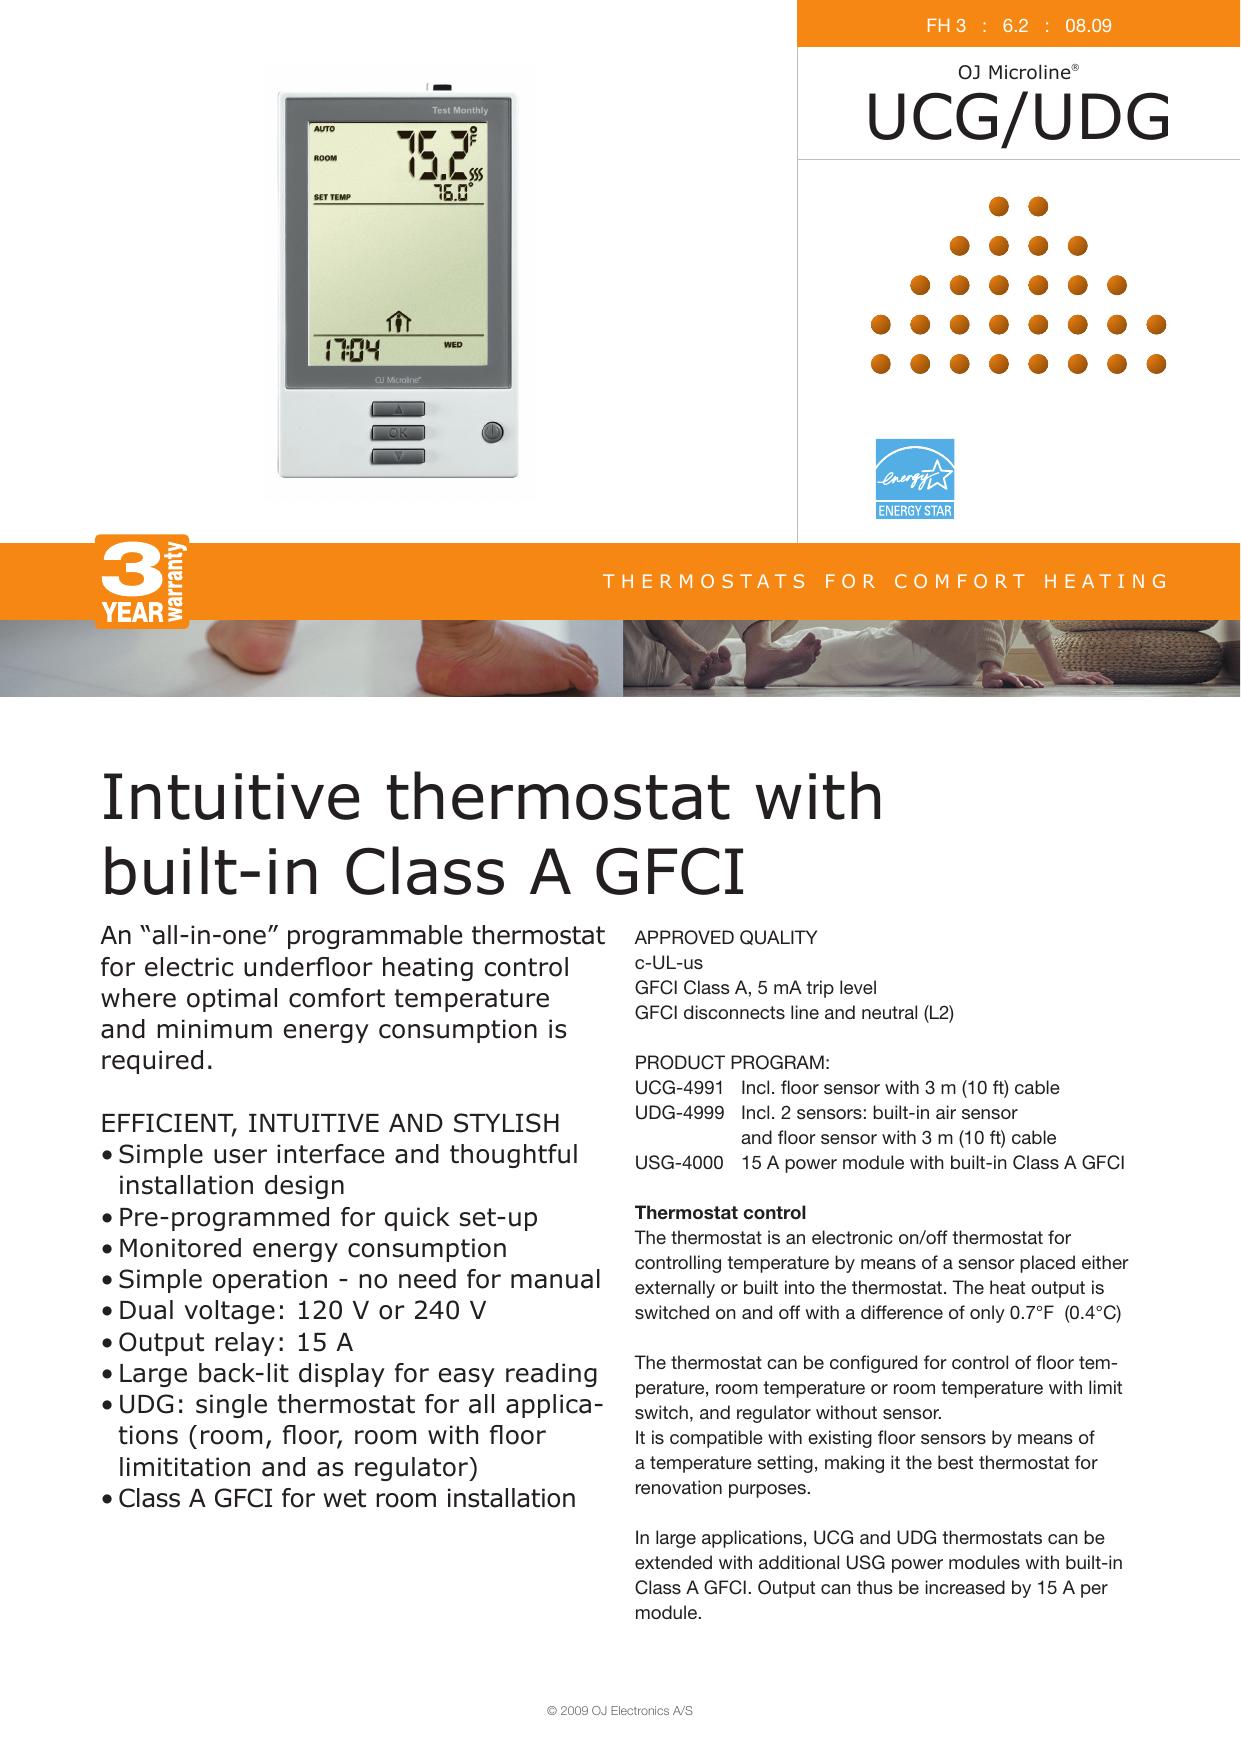 USG-4000 Power Module With Class A GFCI